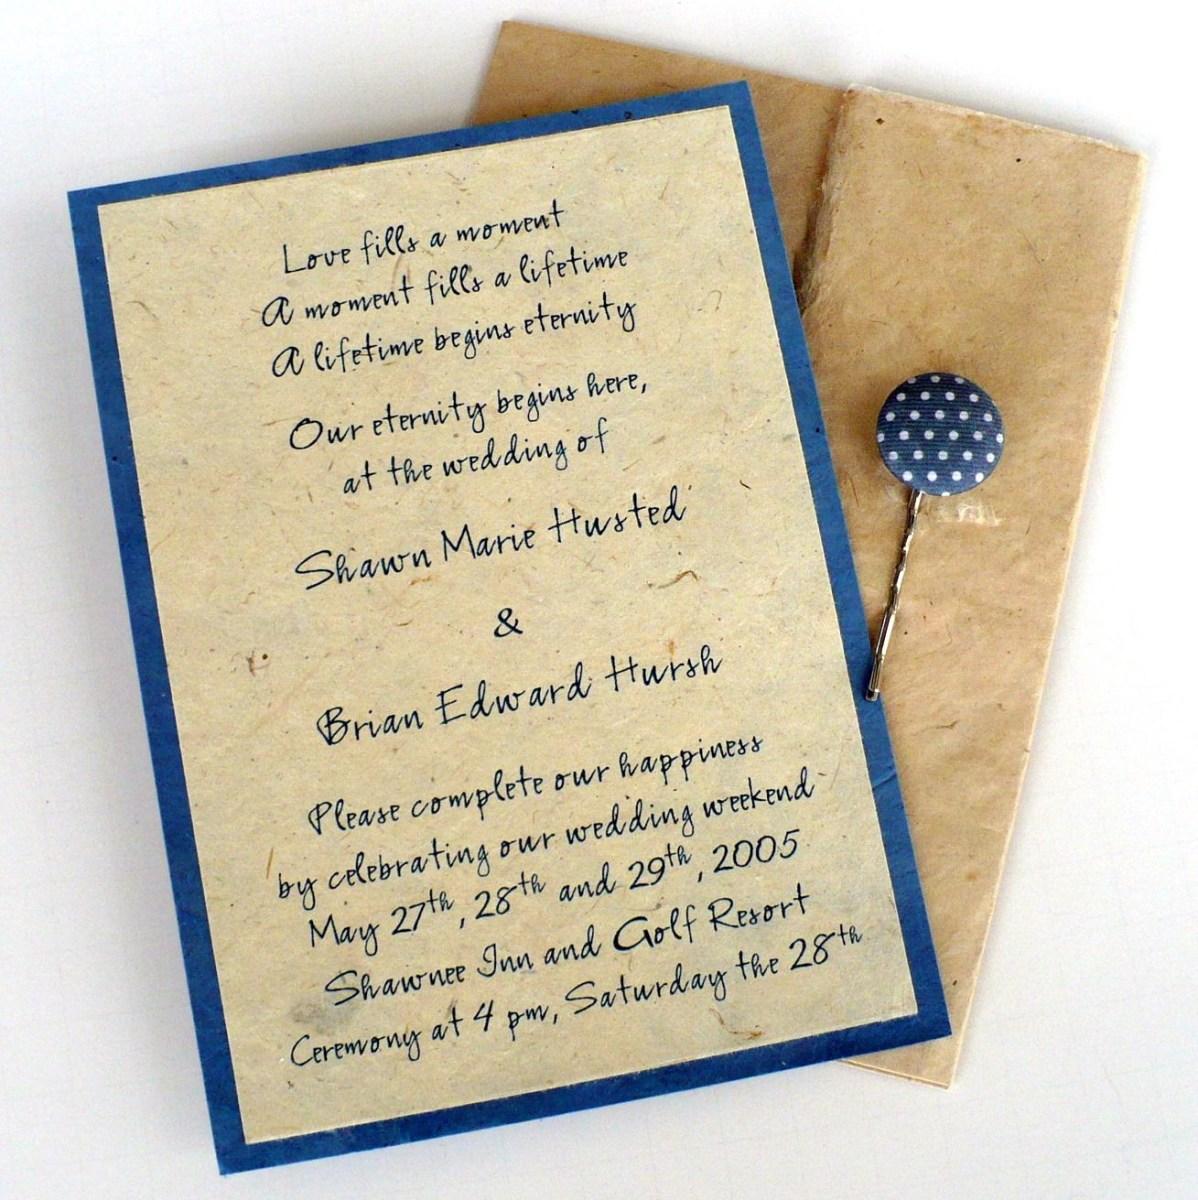 Cute Wedding Invitation Wording Wording For Wedding Invitations Hindu Personal Wedding Invitation